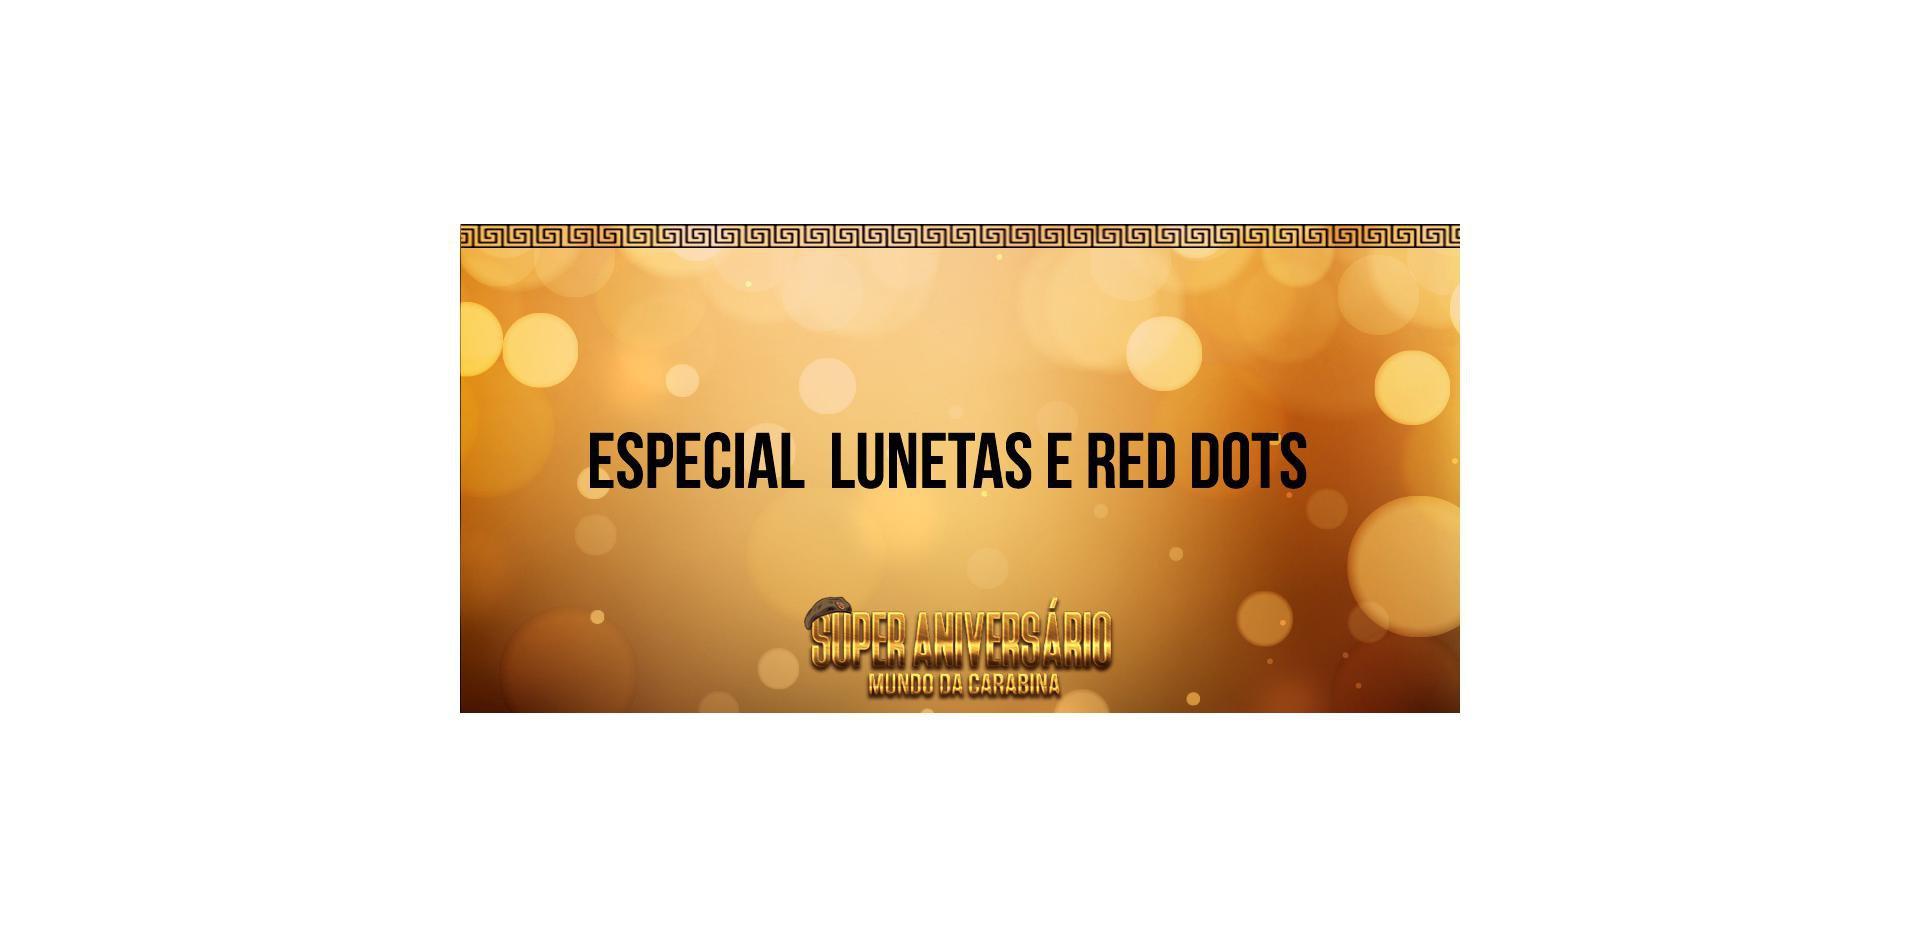 Lunetas e Reddots